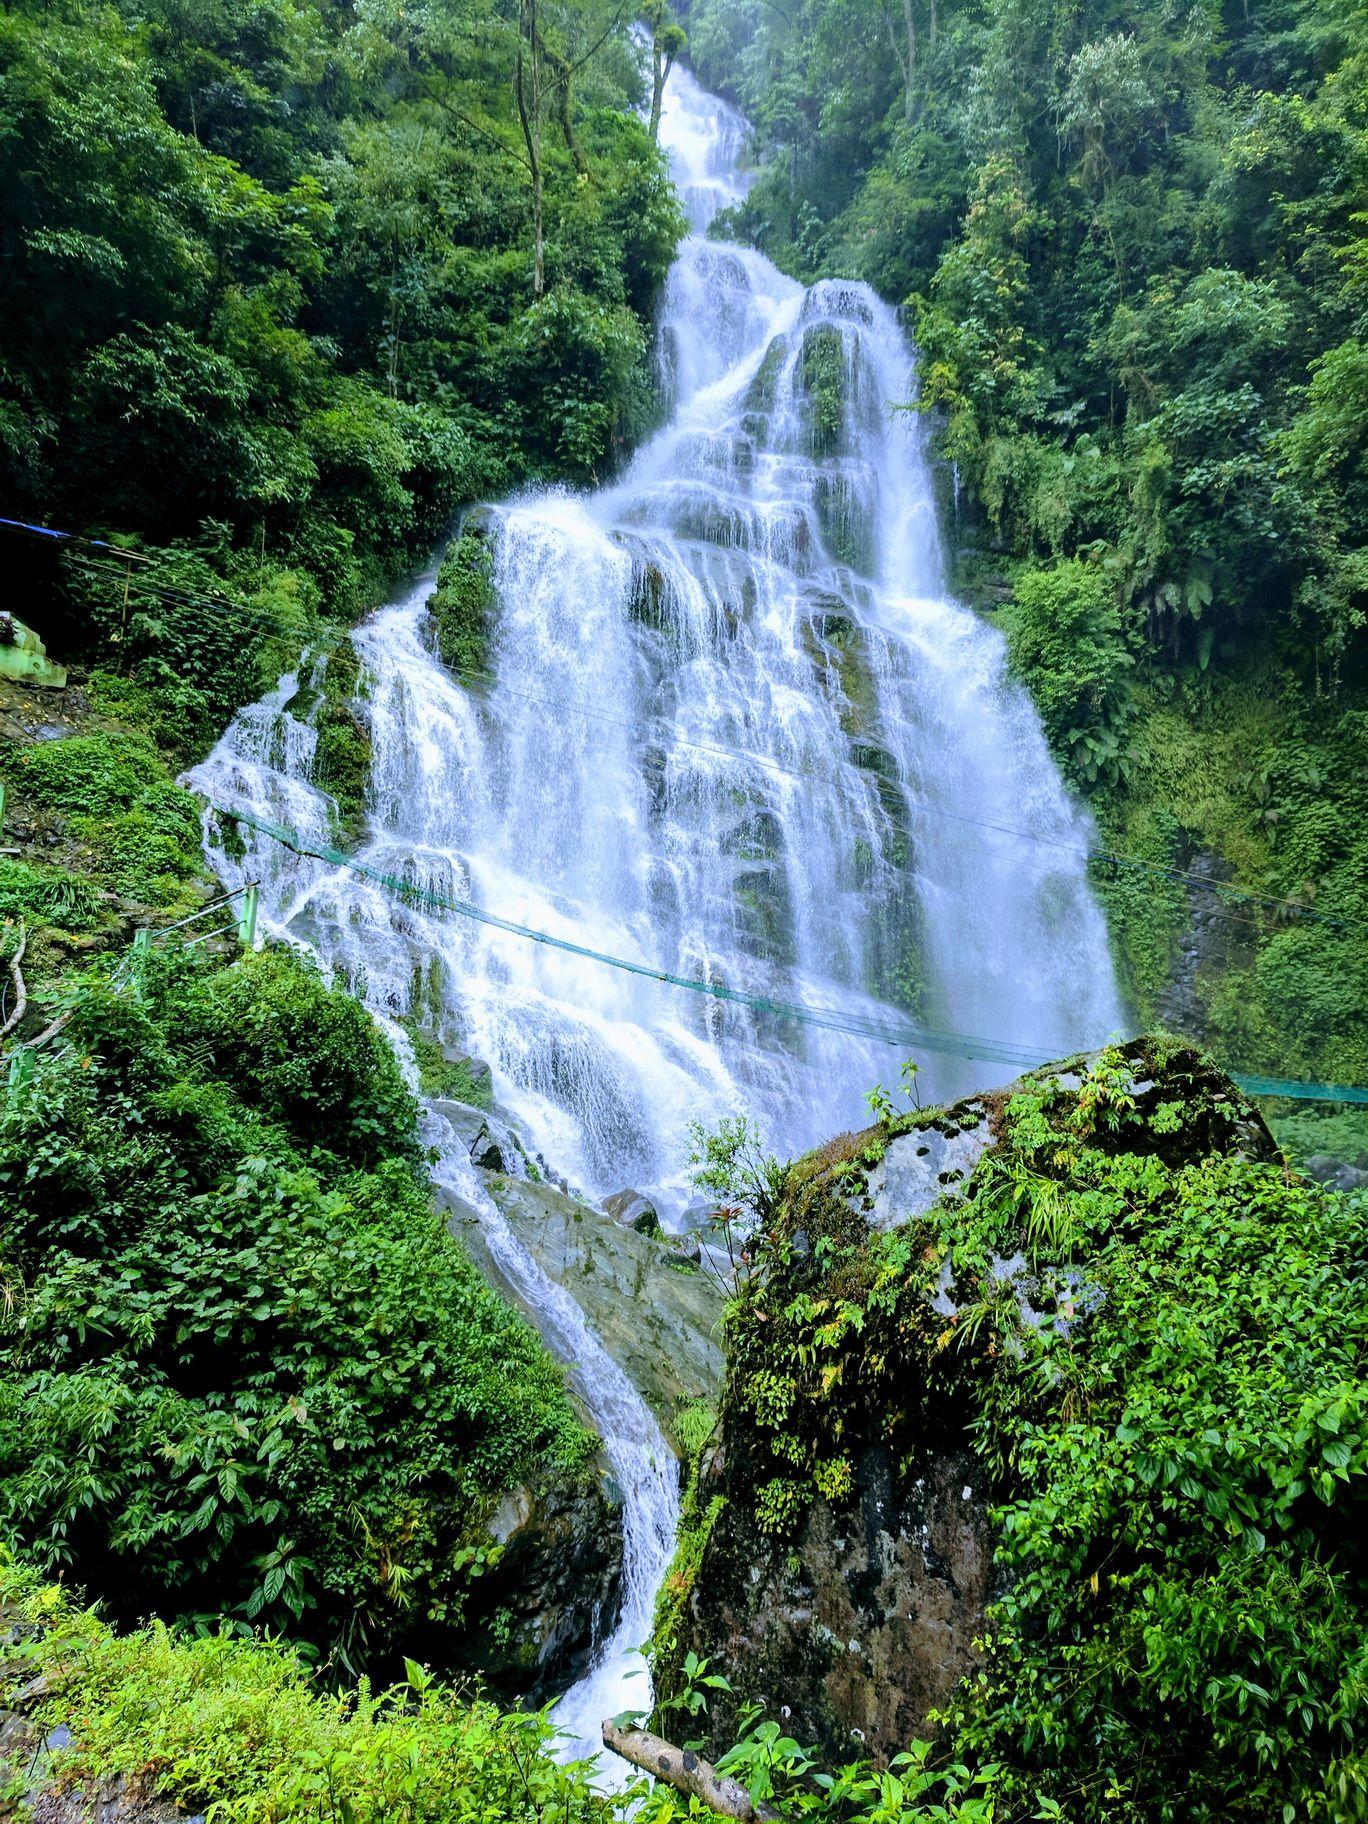 Photo of Kanchenjunga Falls By Nidhi Desai